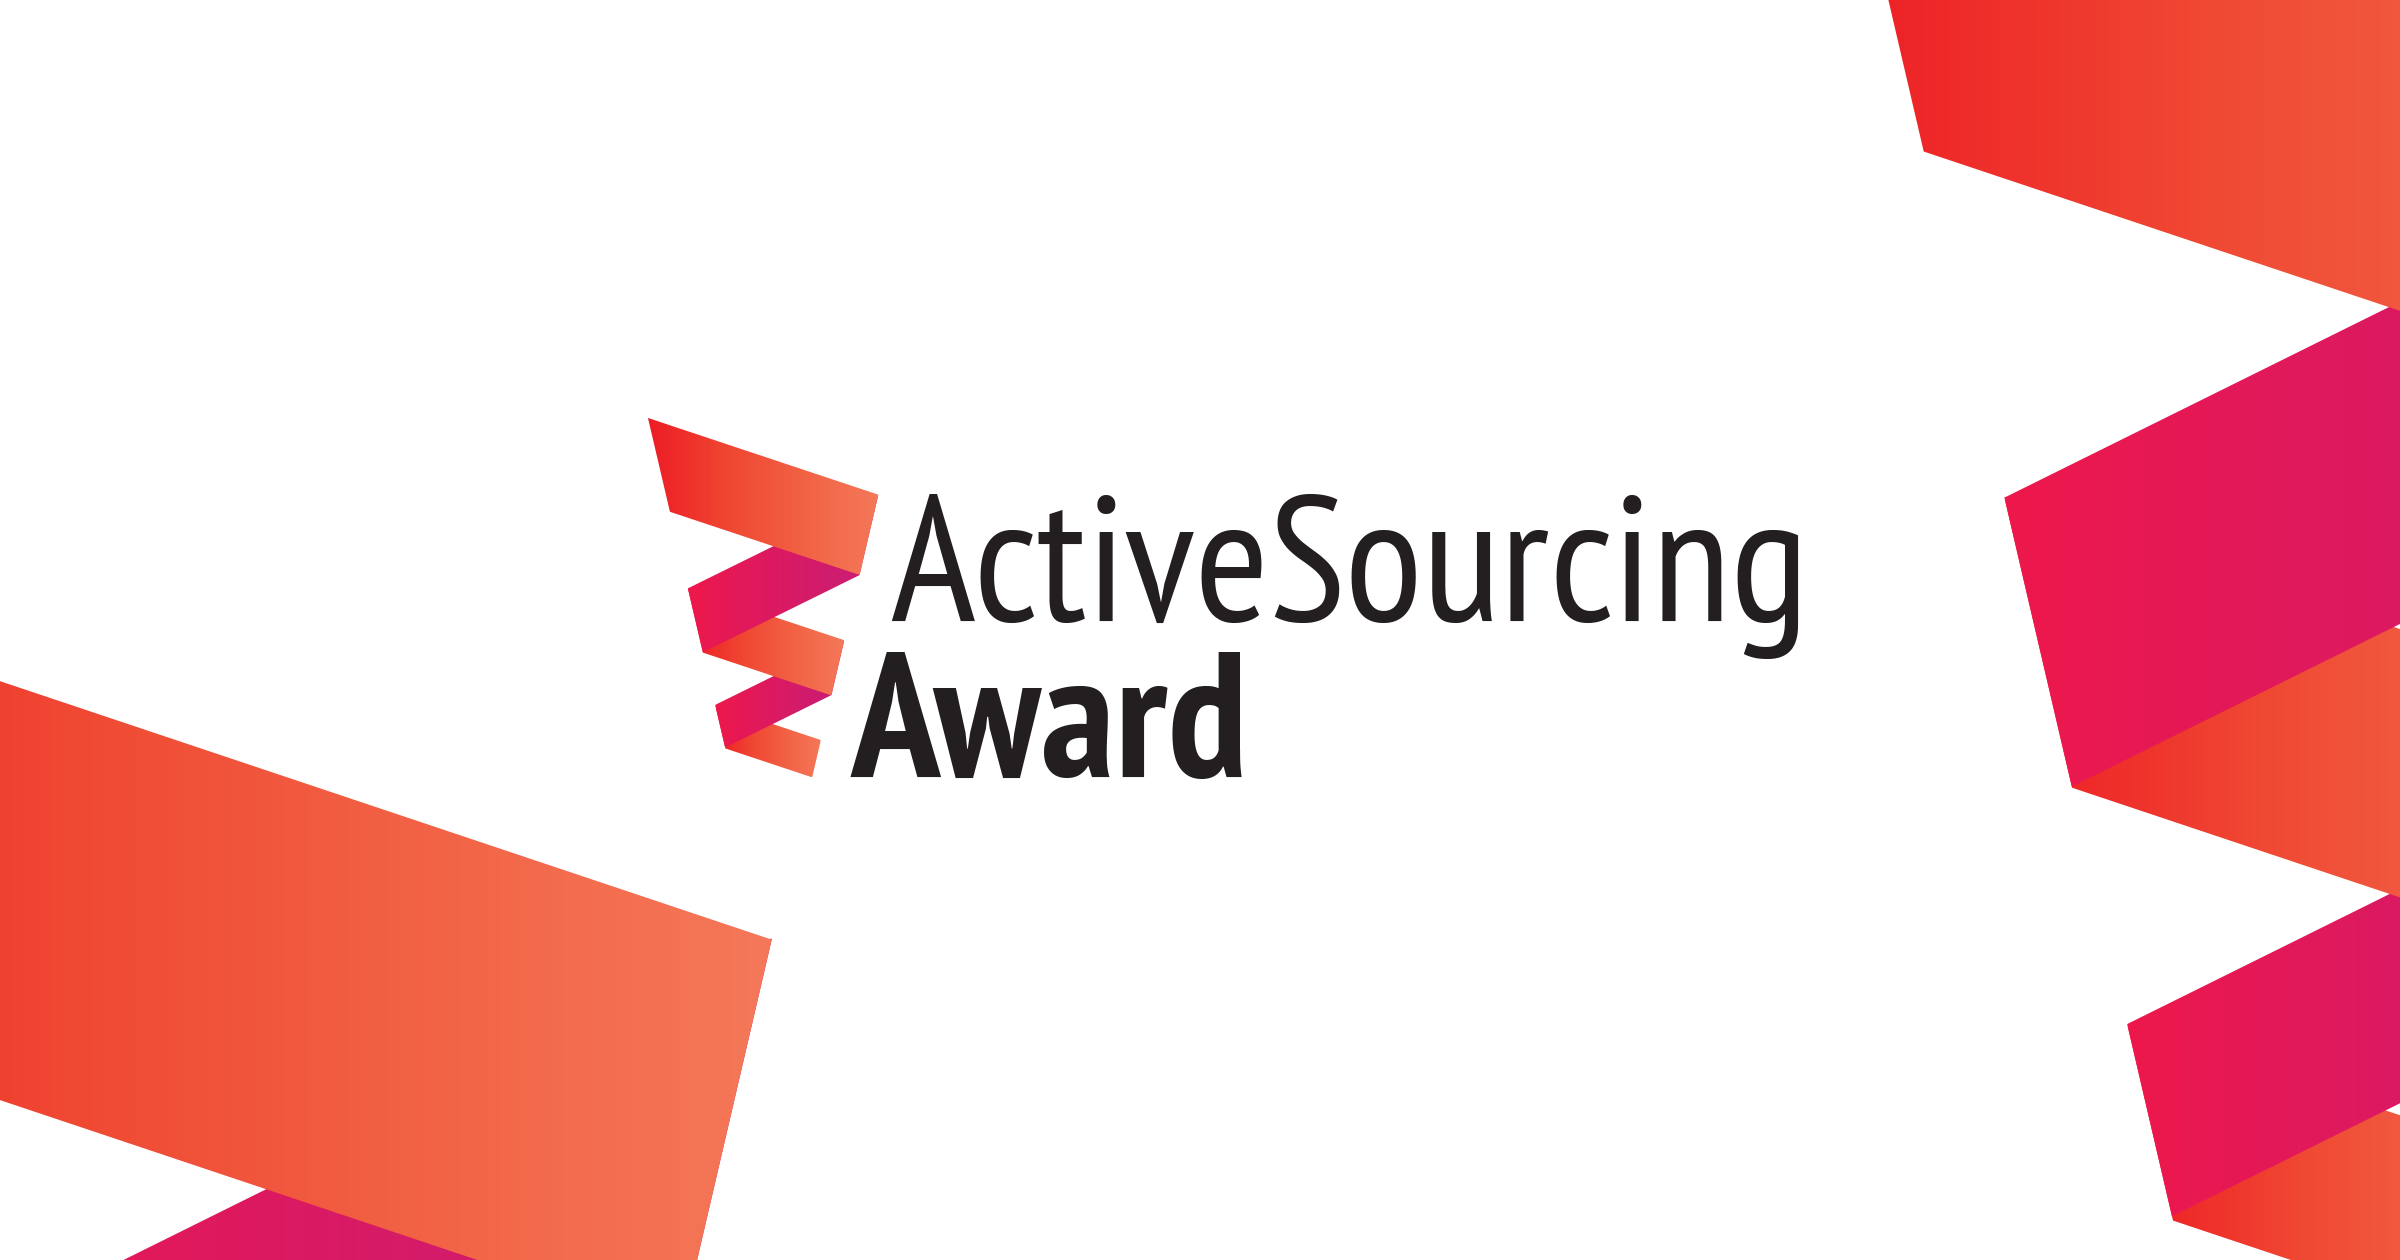 Active Sourcing Award